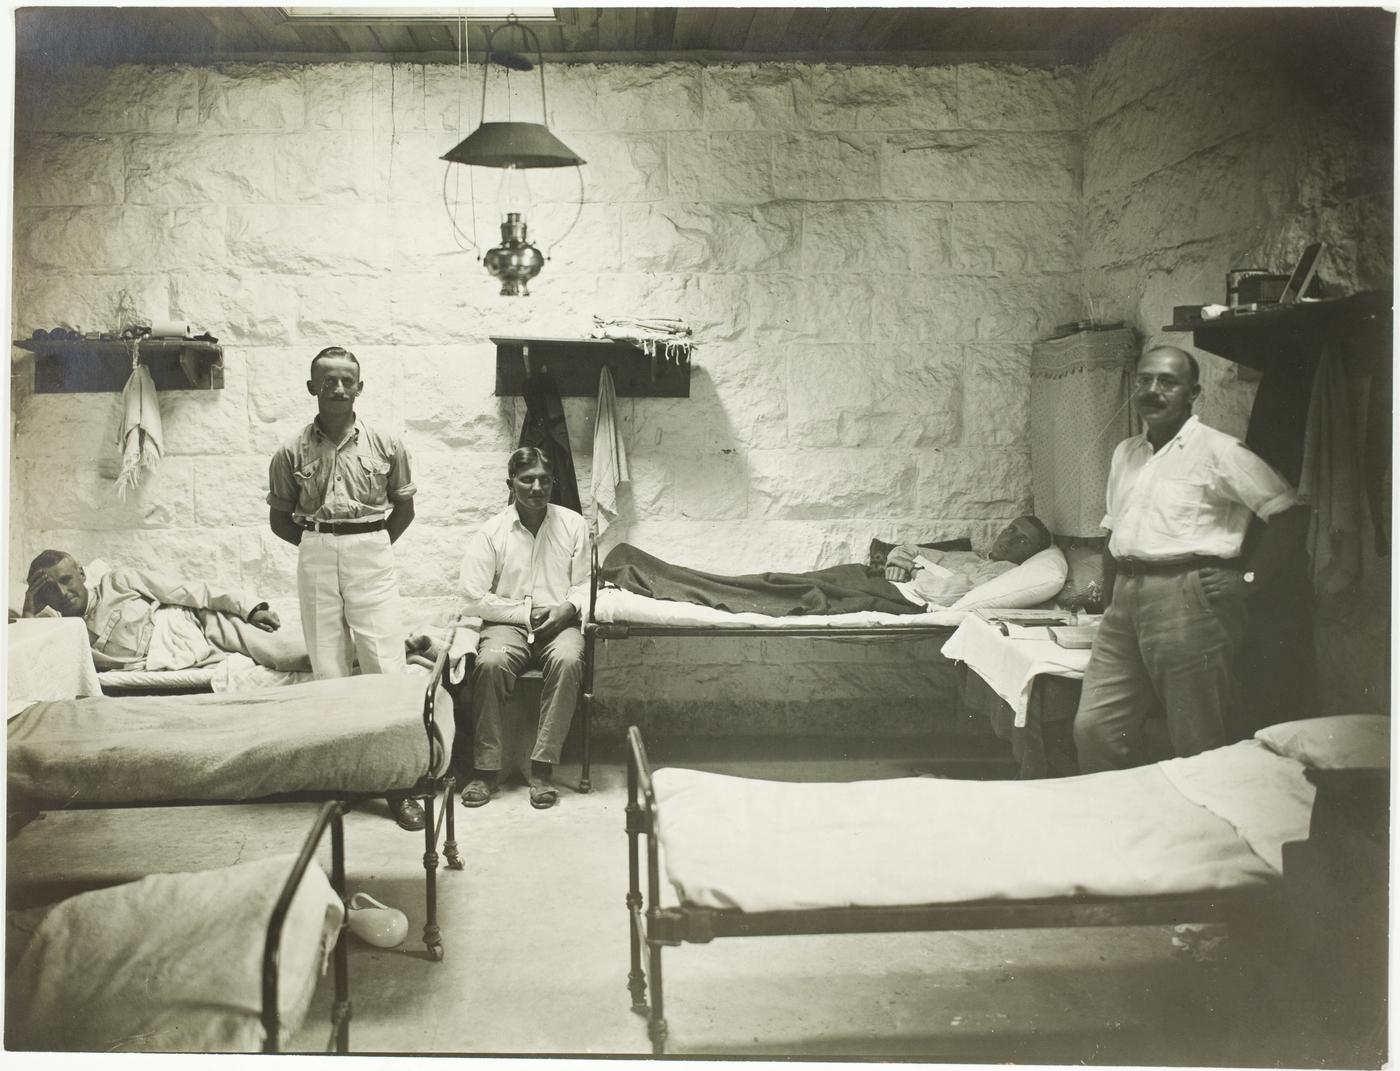 Trial Bay Camp, 1914-1918